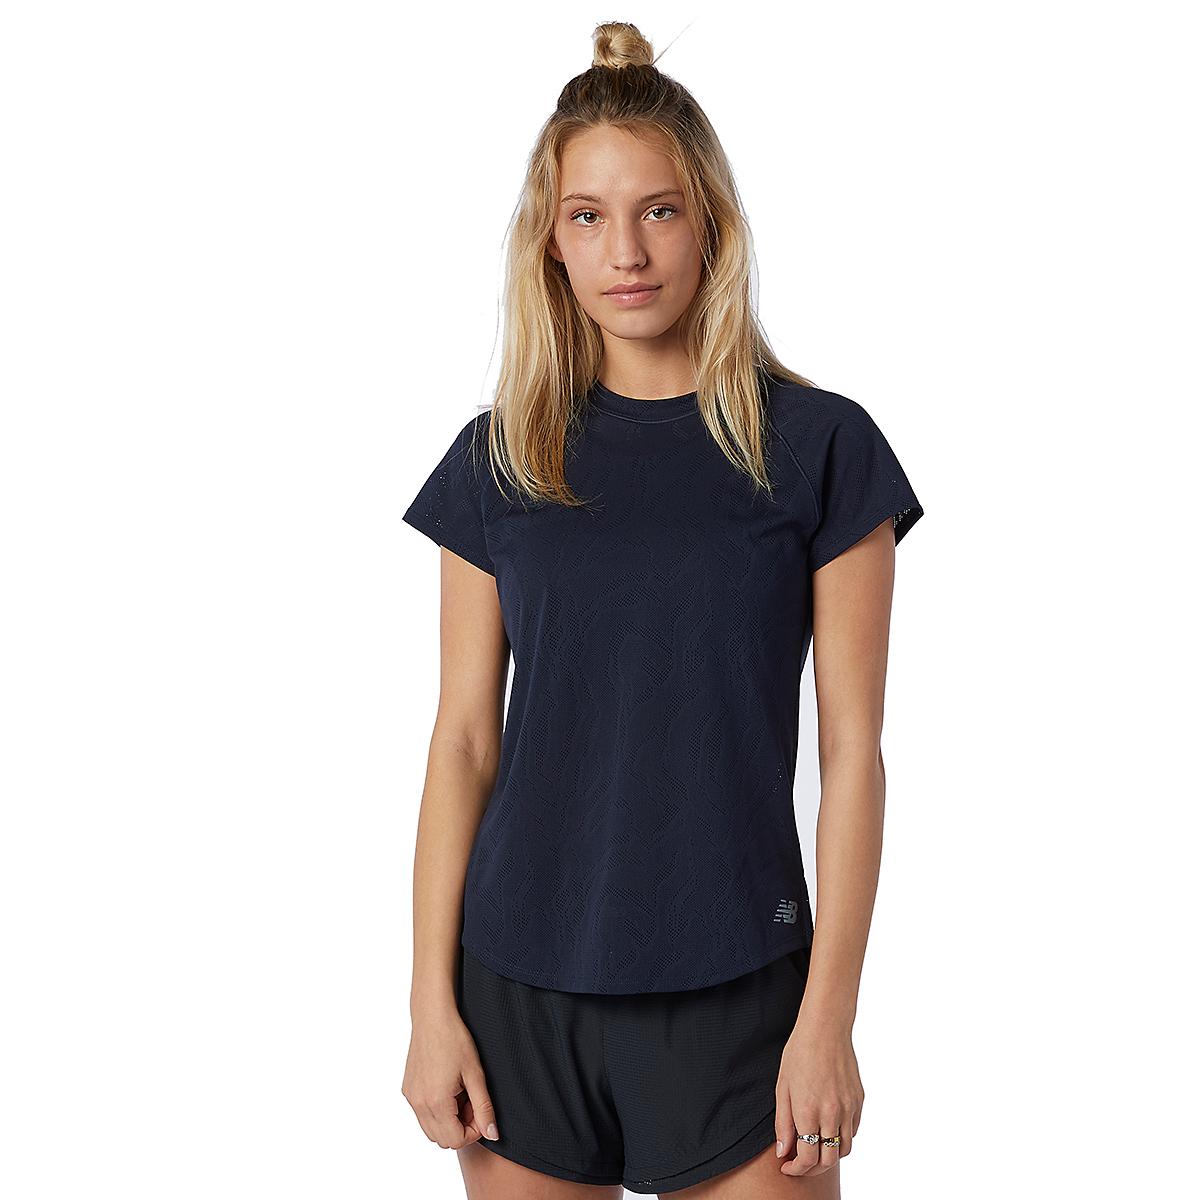 Women's New Balance Q Speed Fuel Jacquard Short Sleeve - Color: Eclipse - Size: XS, Eclipse, large, image 1